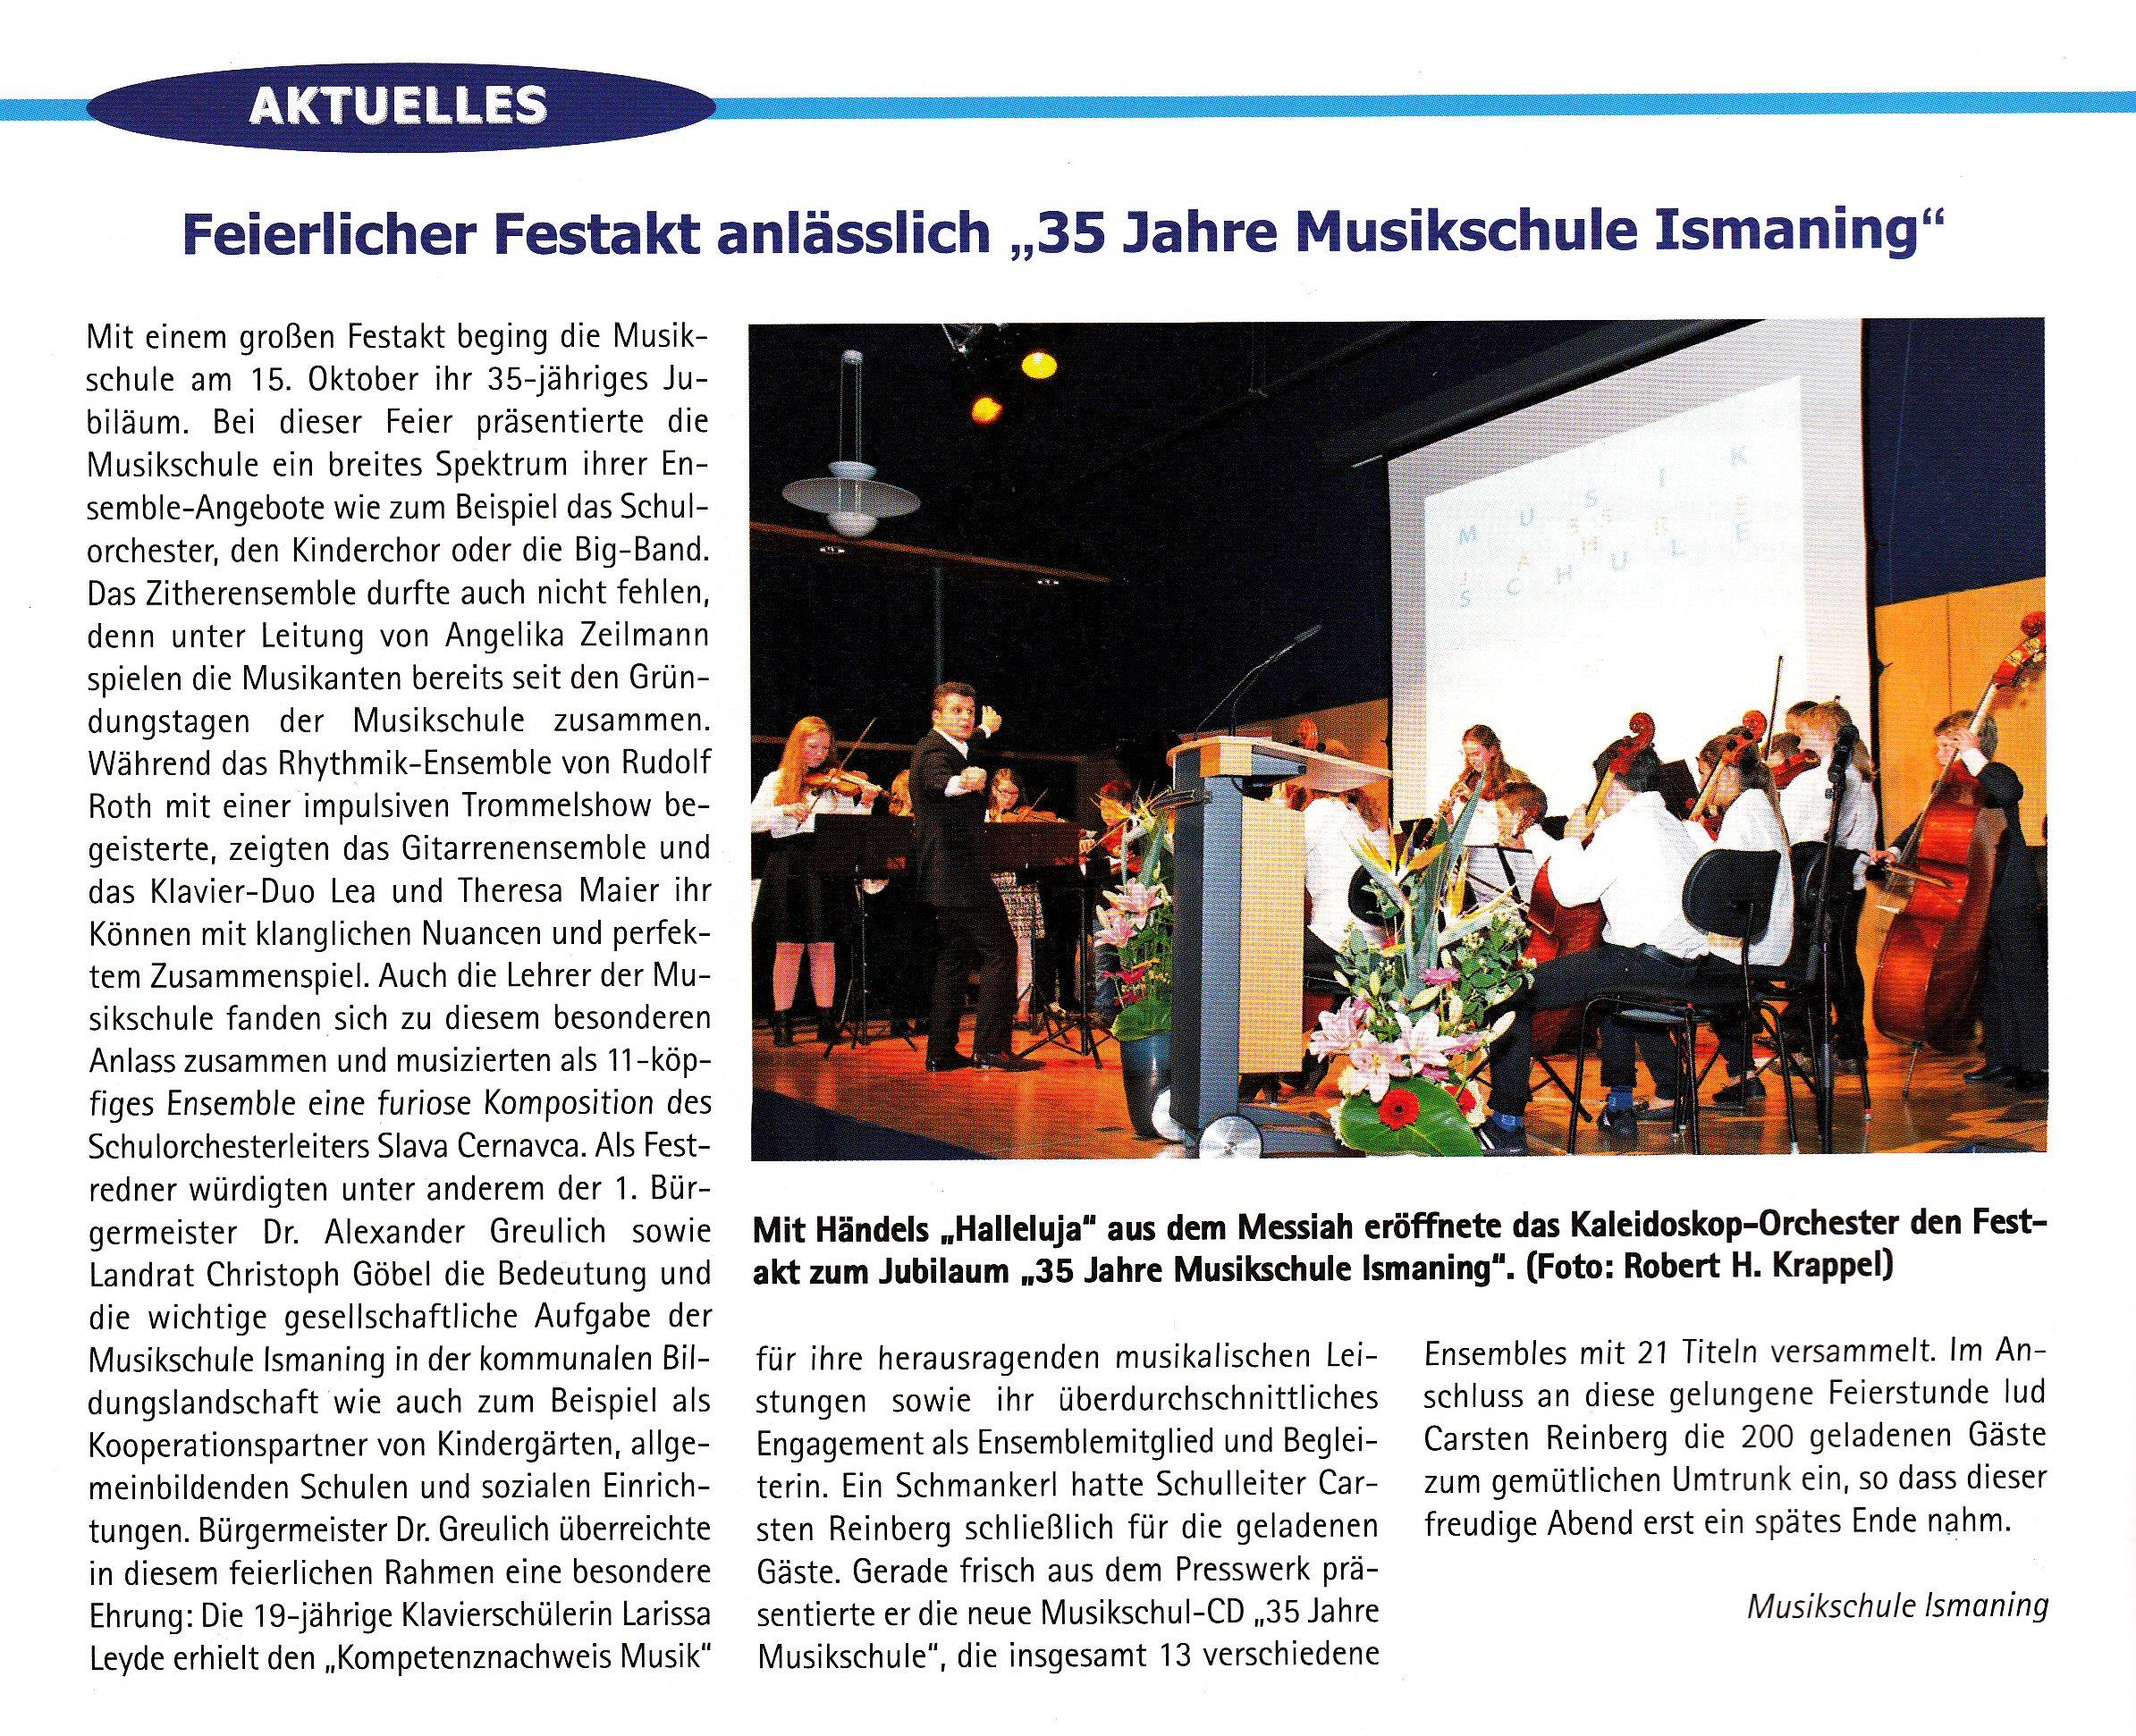 IsmRund_Nr-21_07-11-2014_Festakt